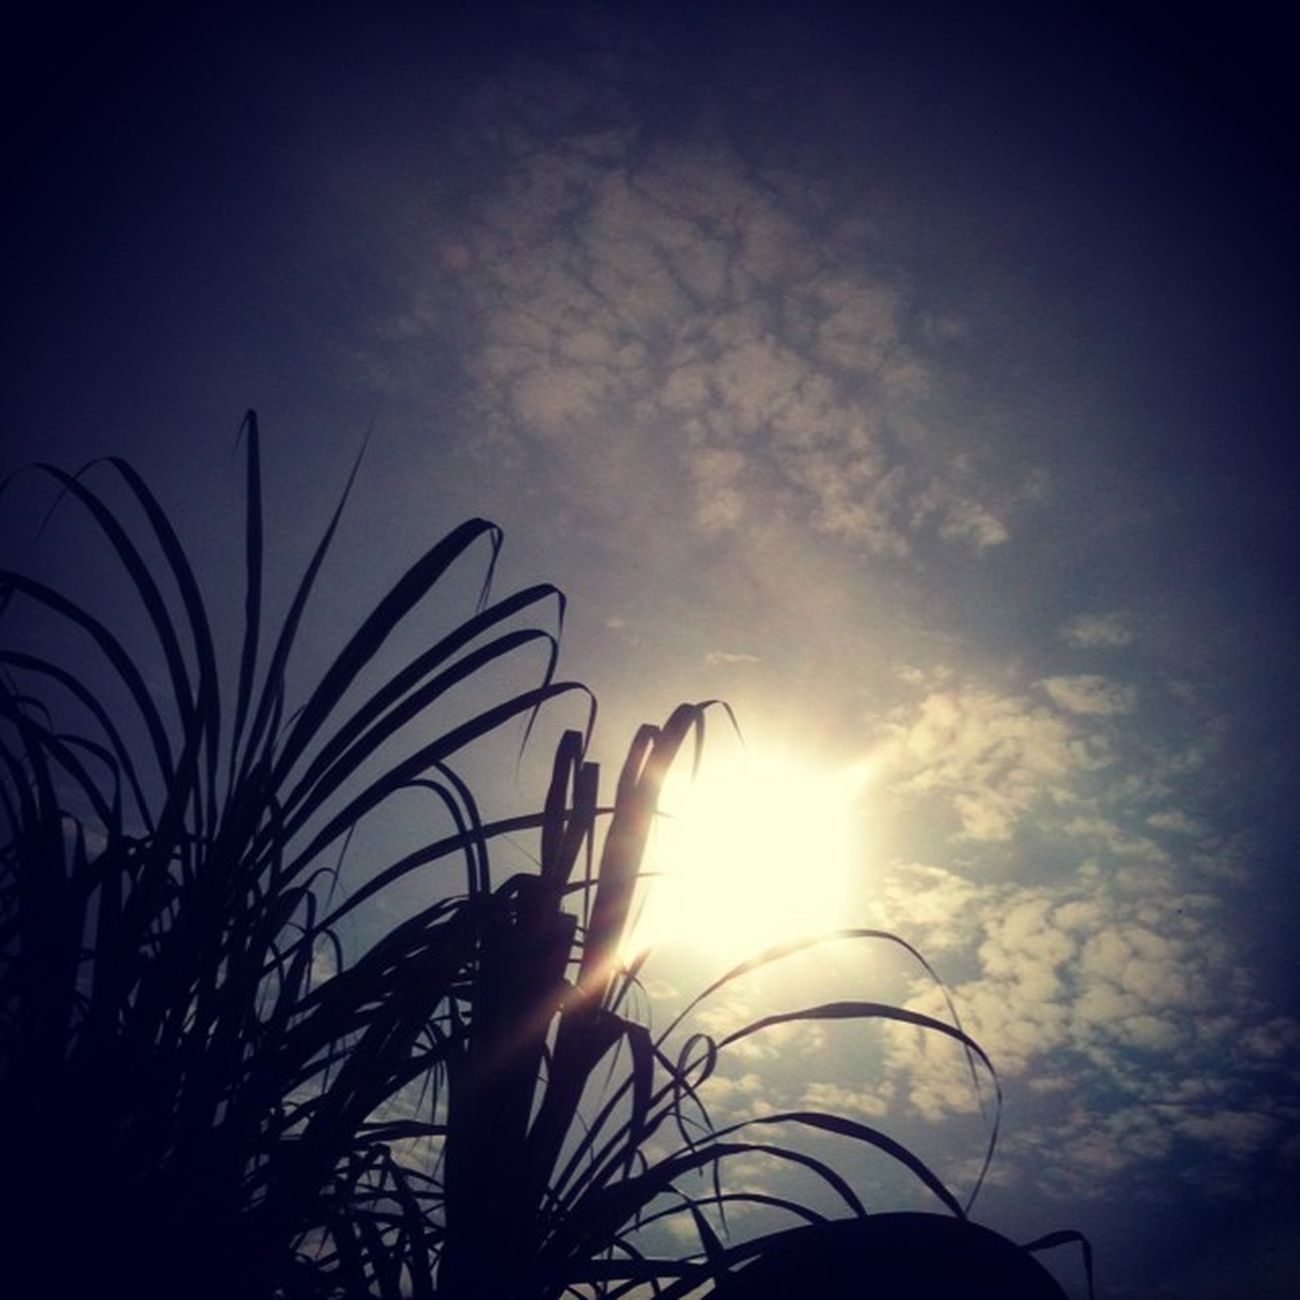 Acordei com o sol me dando Bom Dia DIALINDOOO FeitoPeloMeuPai Boomdiiaa